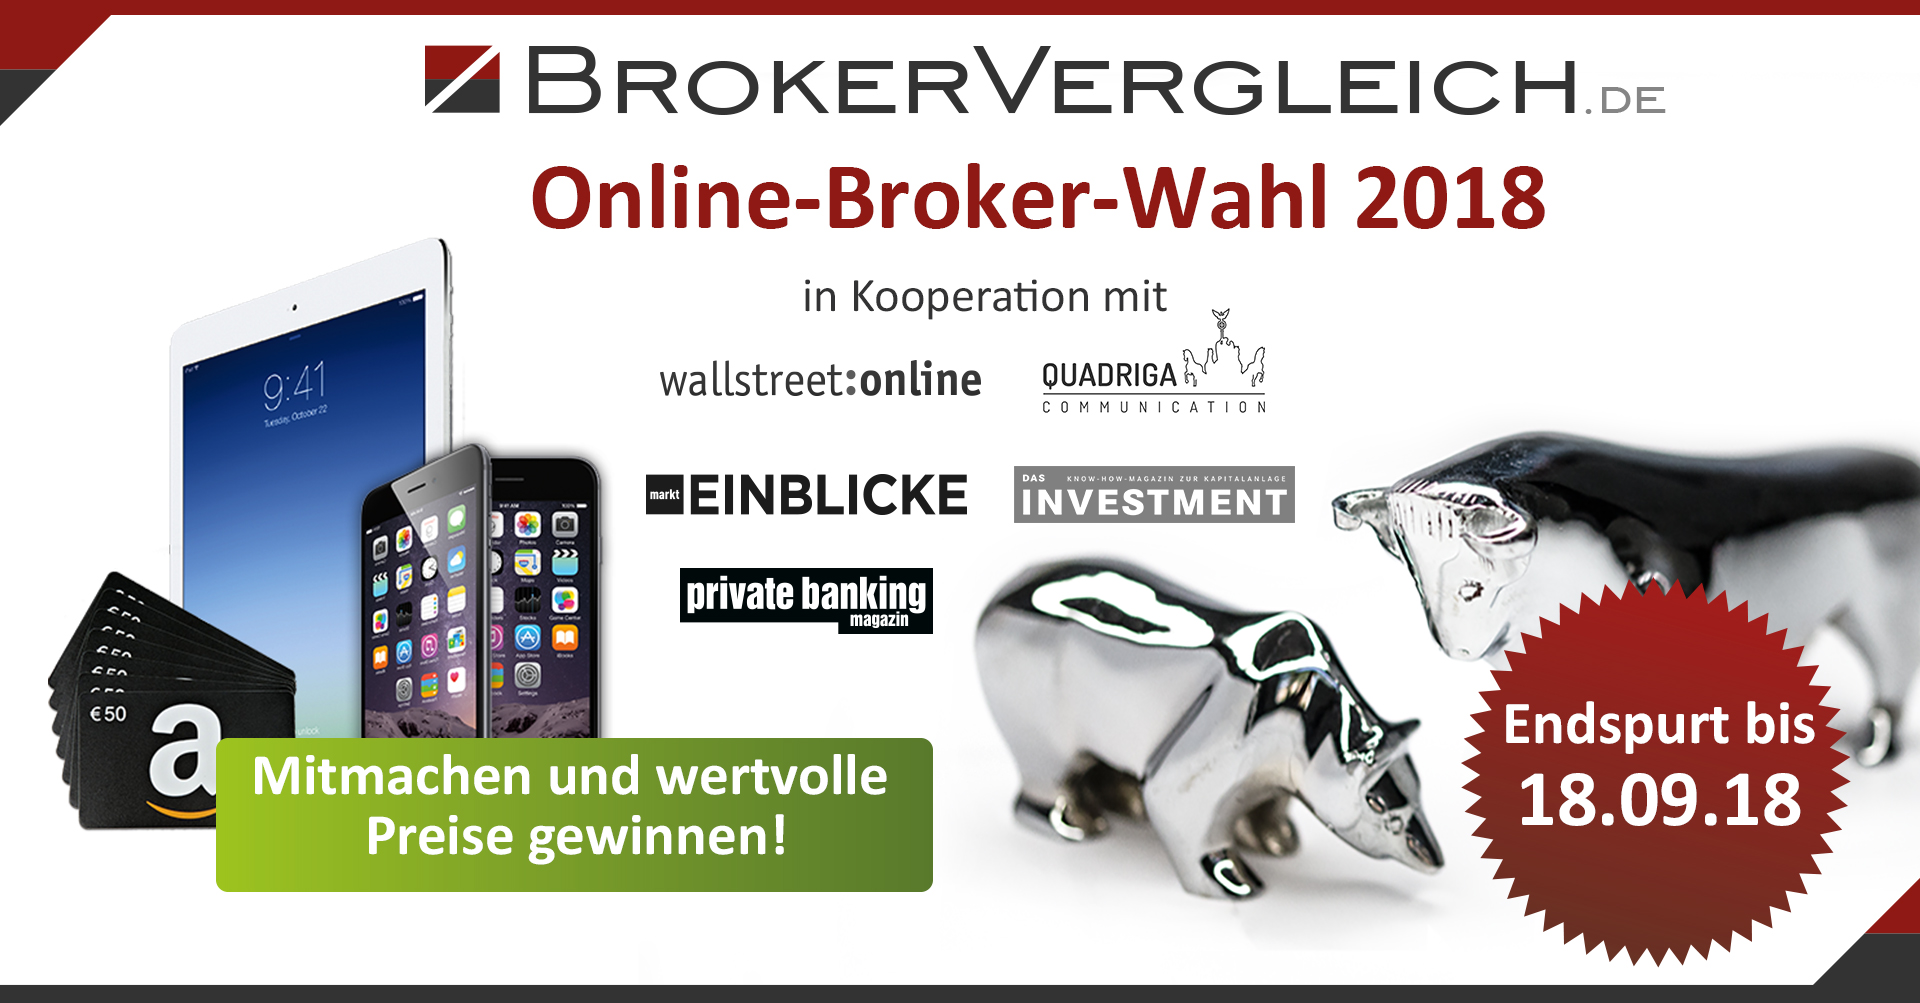 online-broker-2018-brokervergleich-de-social-media-banner-gross.jpg